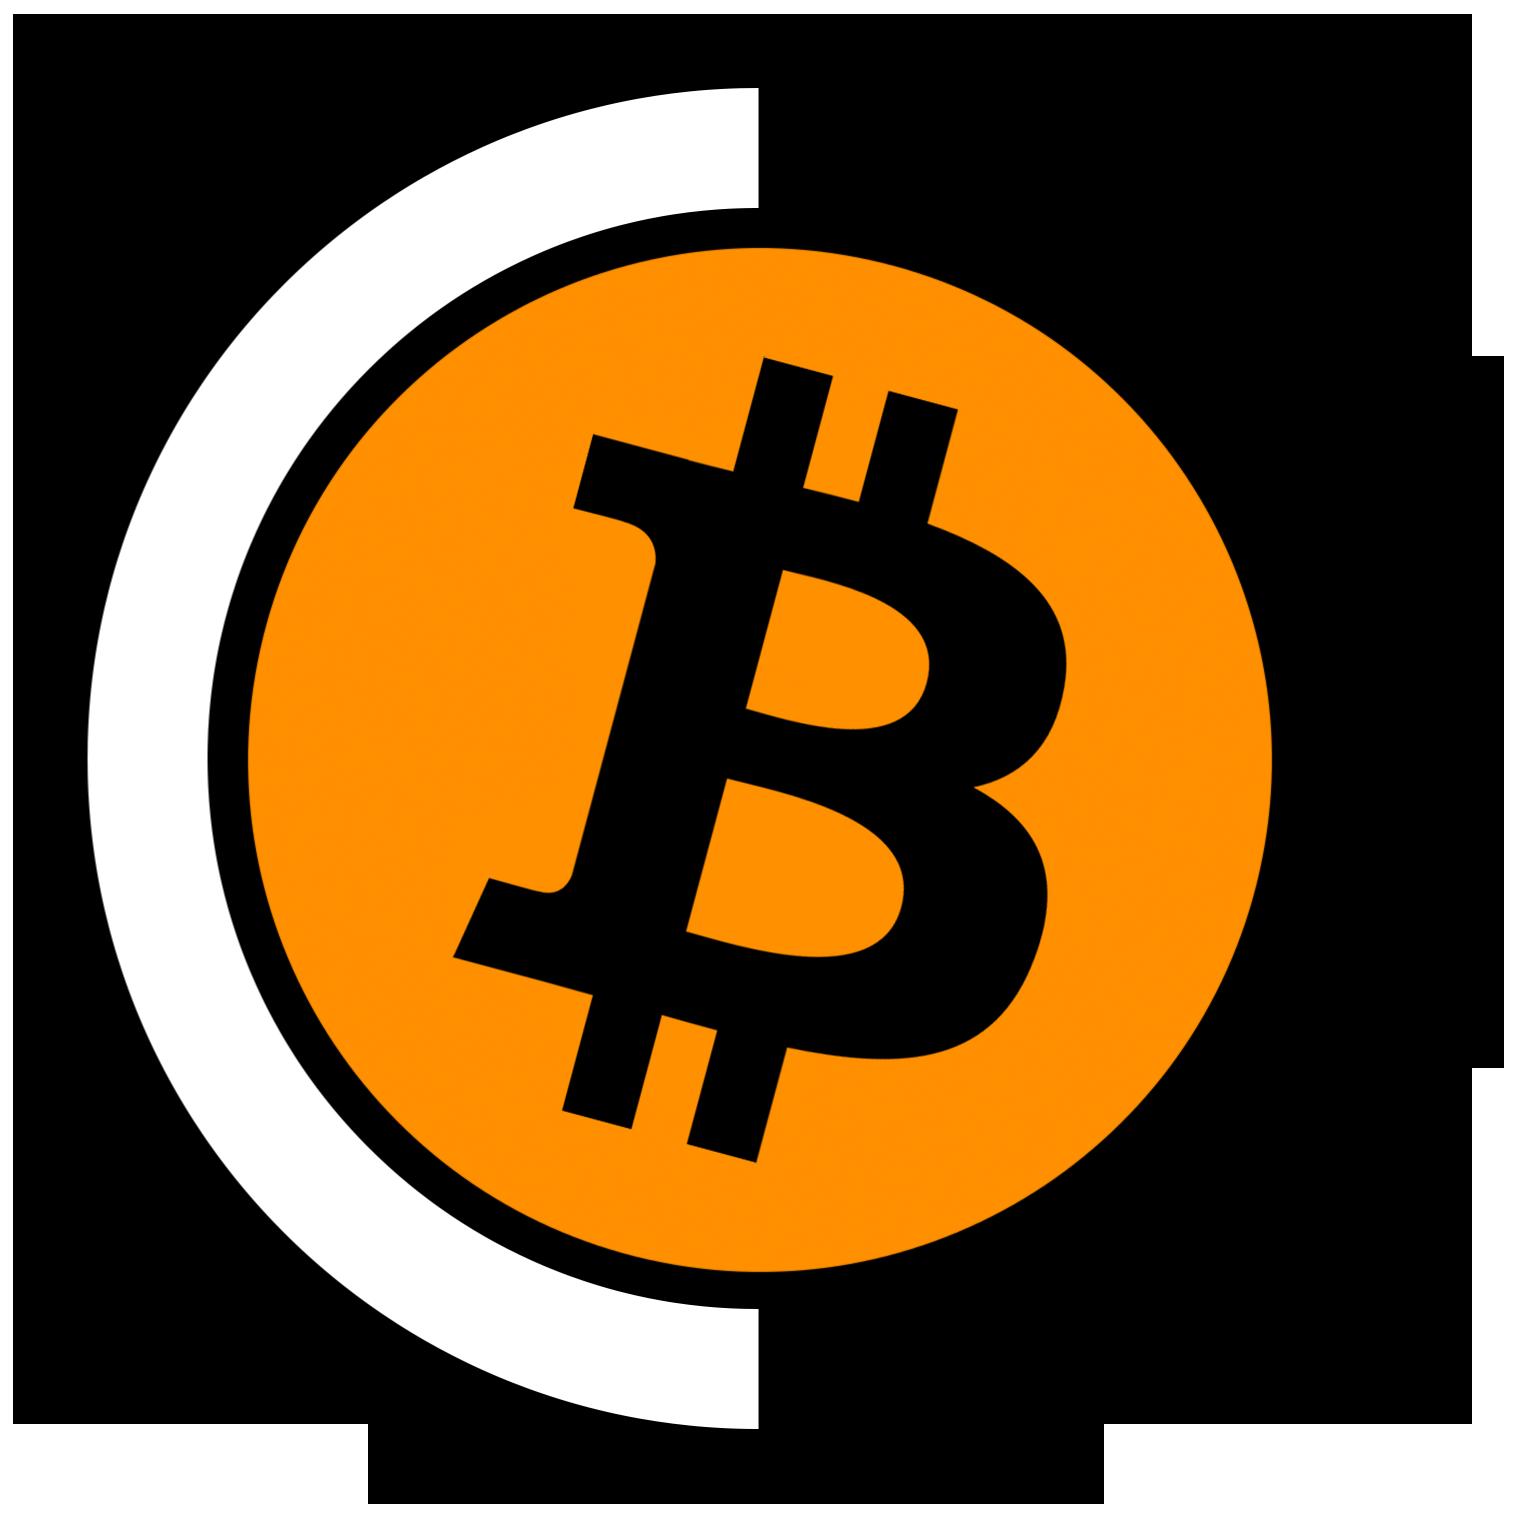 Bitcoin Logo Bitcoincombination In 2020 Bitcoin Logo Logos Bitcoin